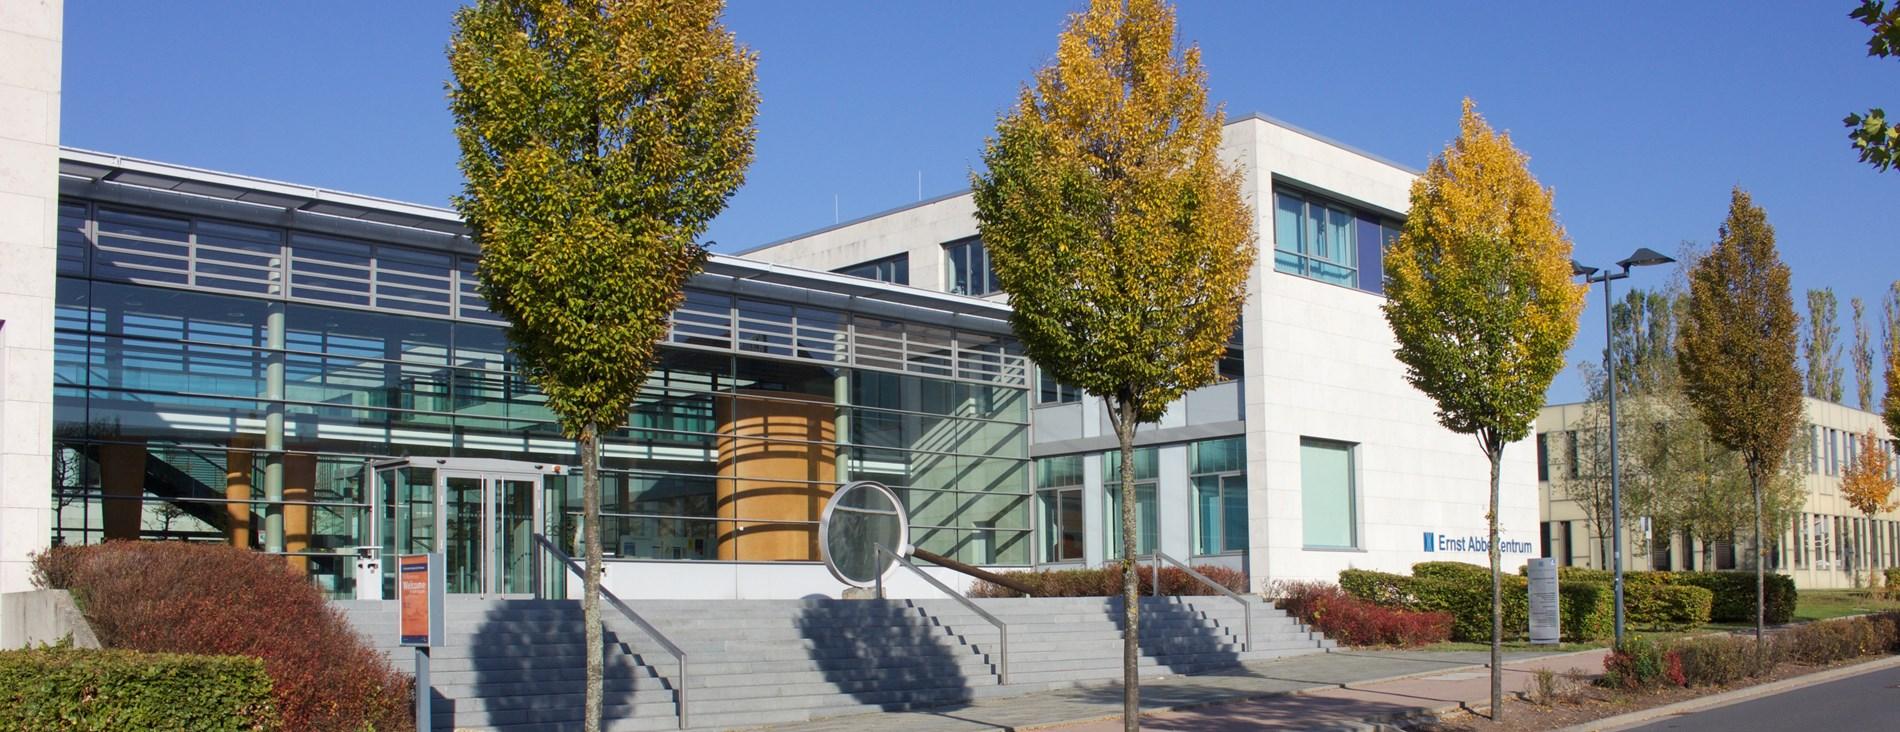 Ilmenau University of Technology-Photos-2